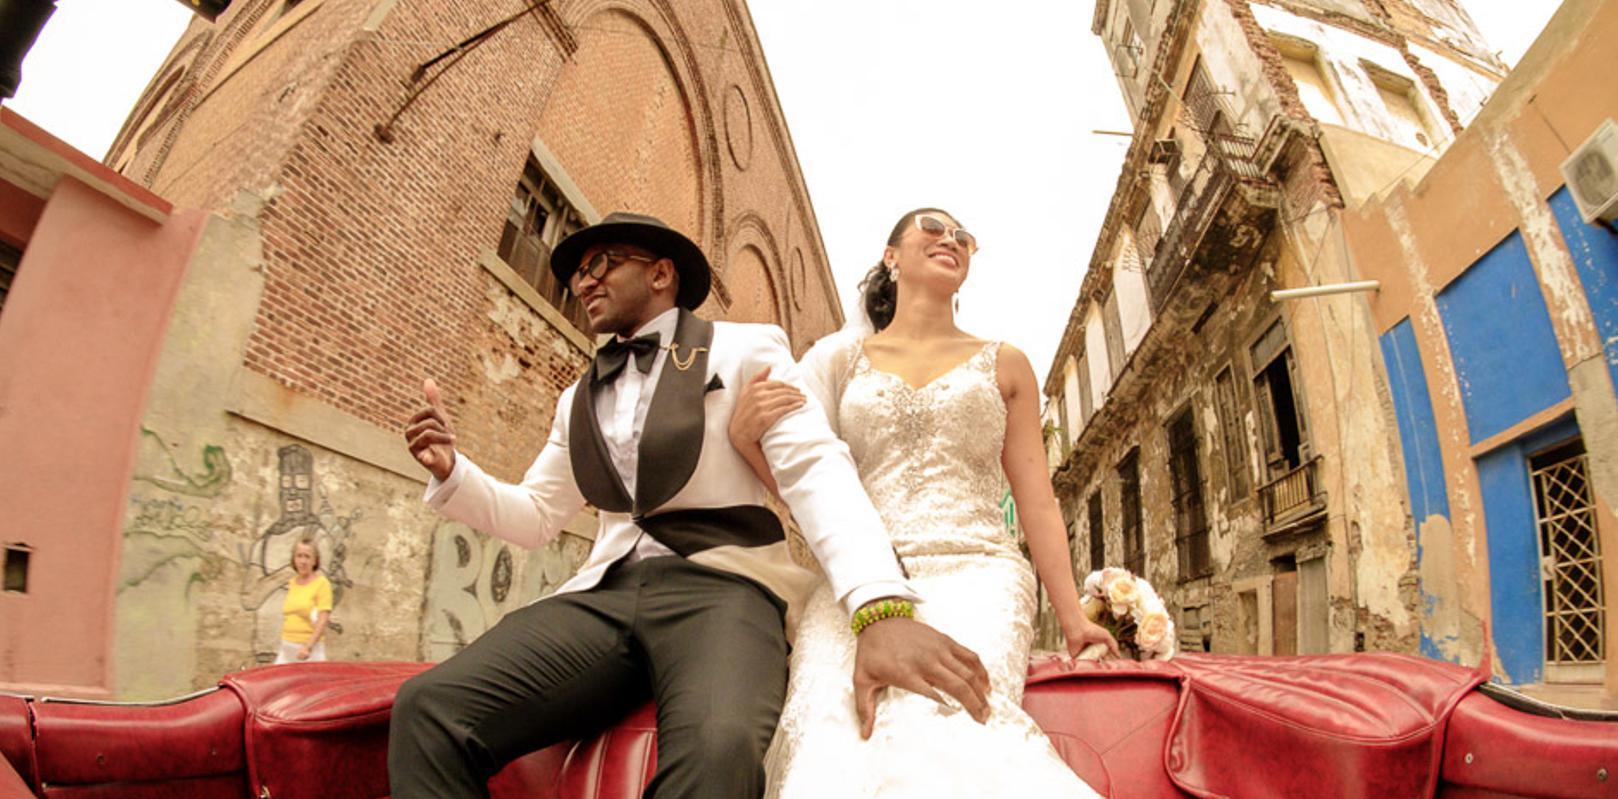 bodas-sin-clasificar-sin-tema-cuba-41111.jpg